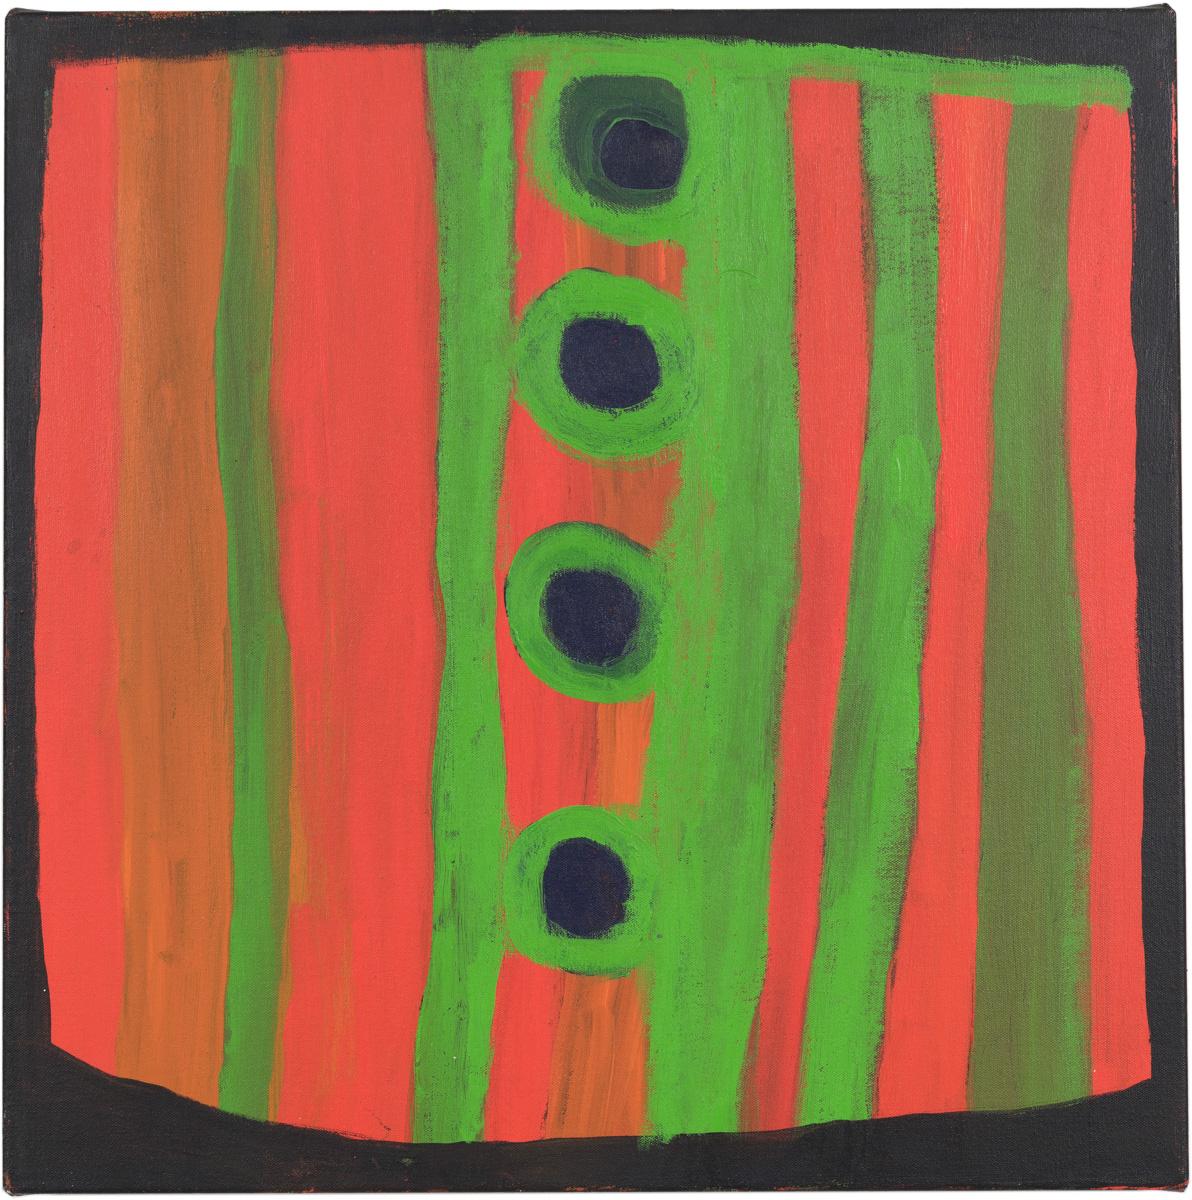 Dolly Snell, Paparta Jila, acrylic on canvas, 60 x 60 cm